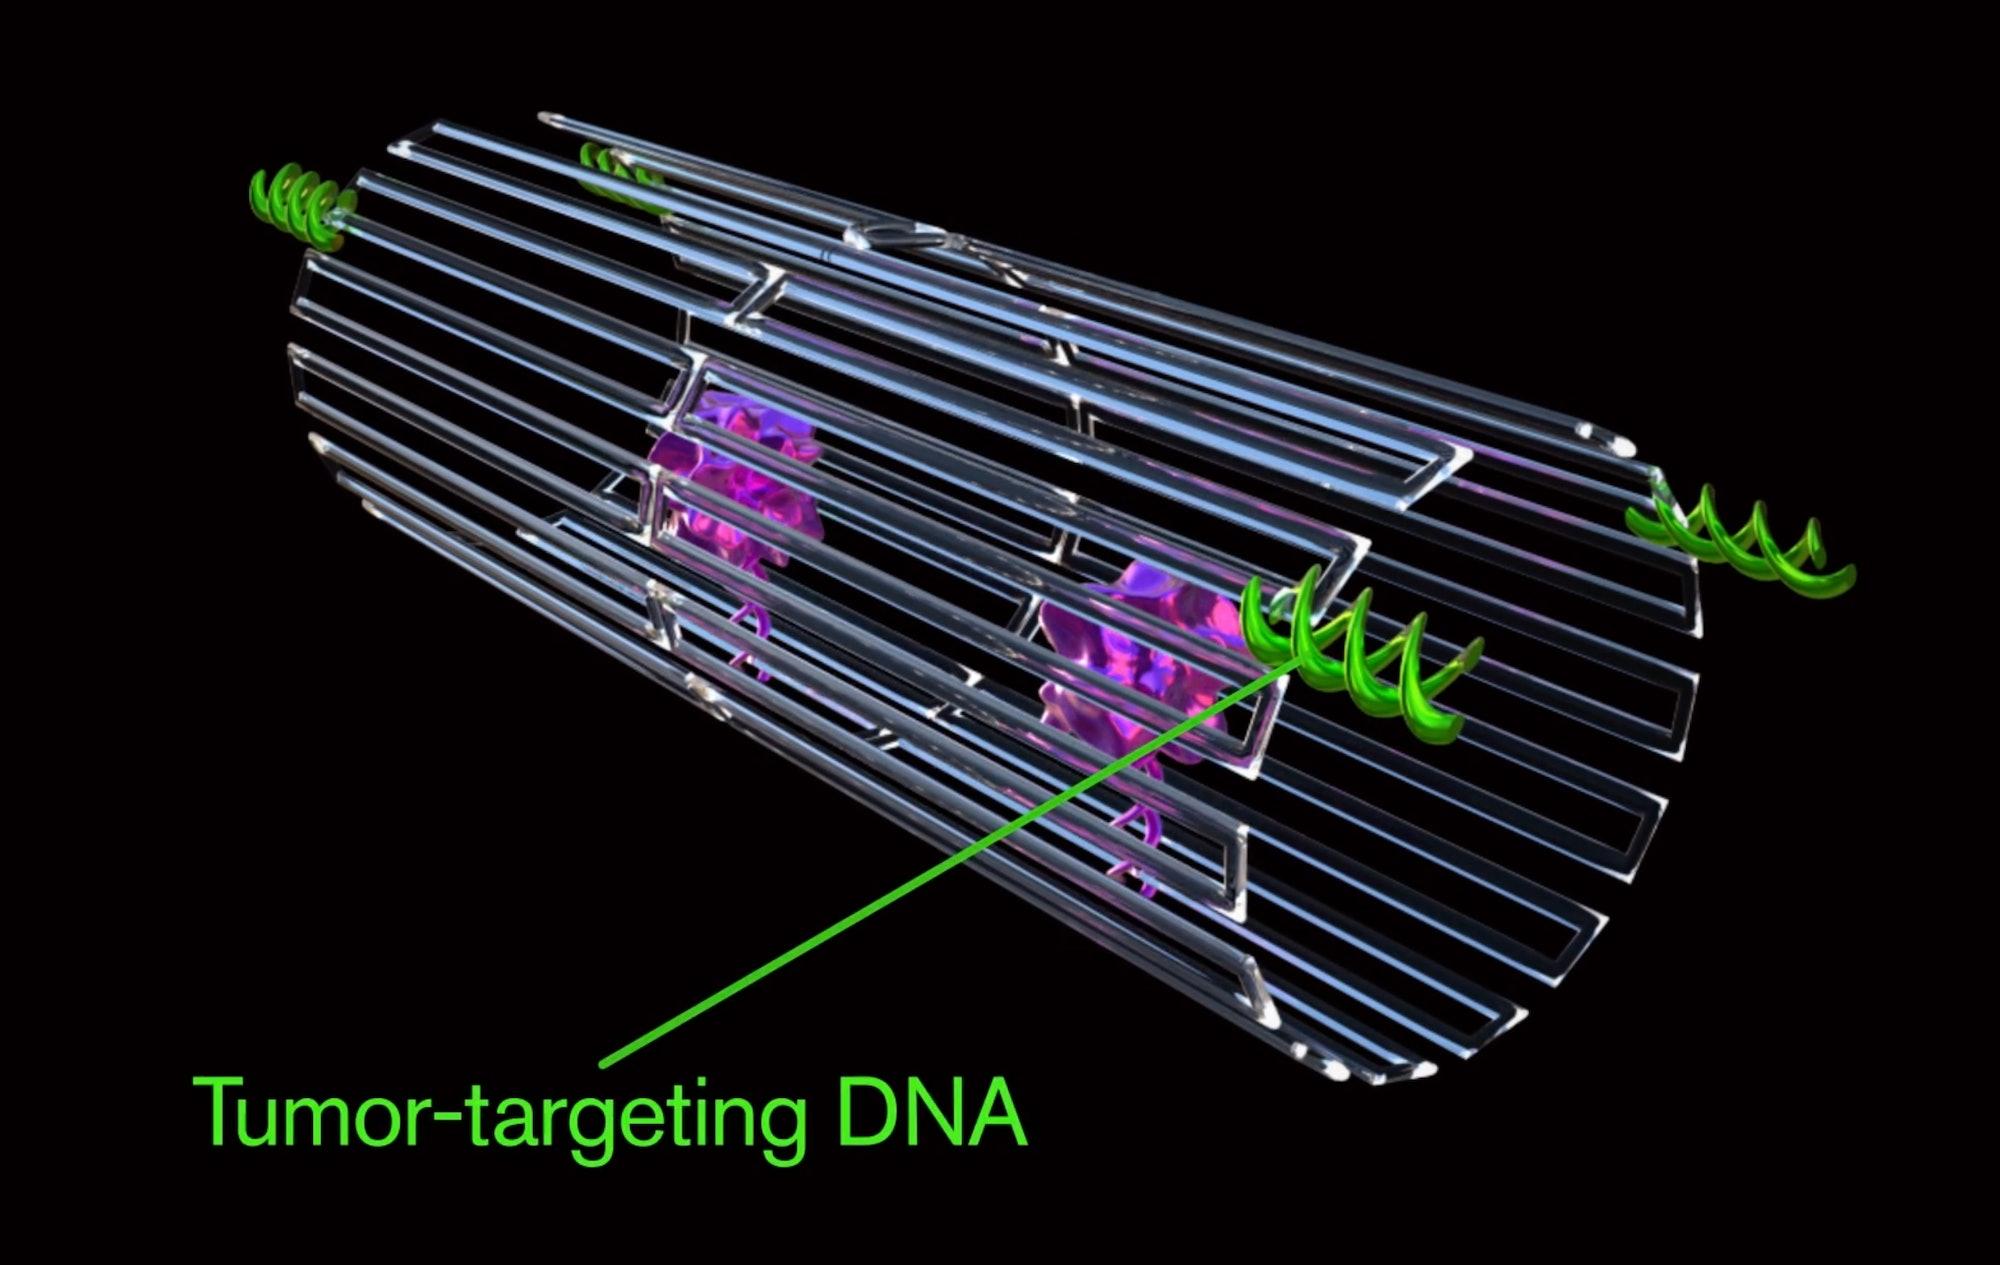 DNA origami nanorobot